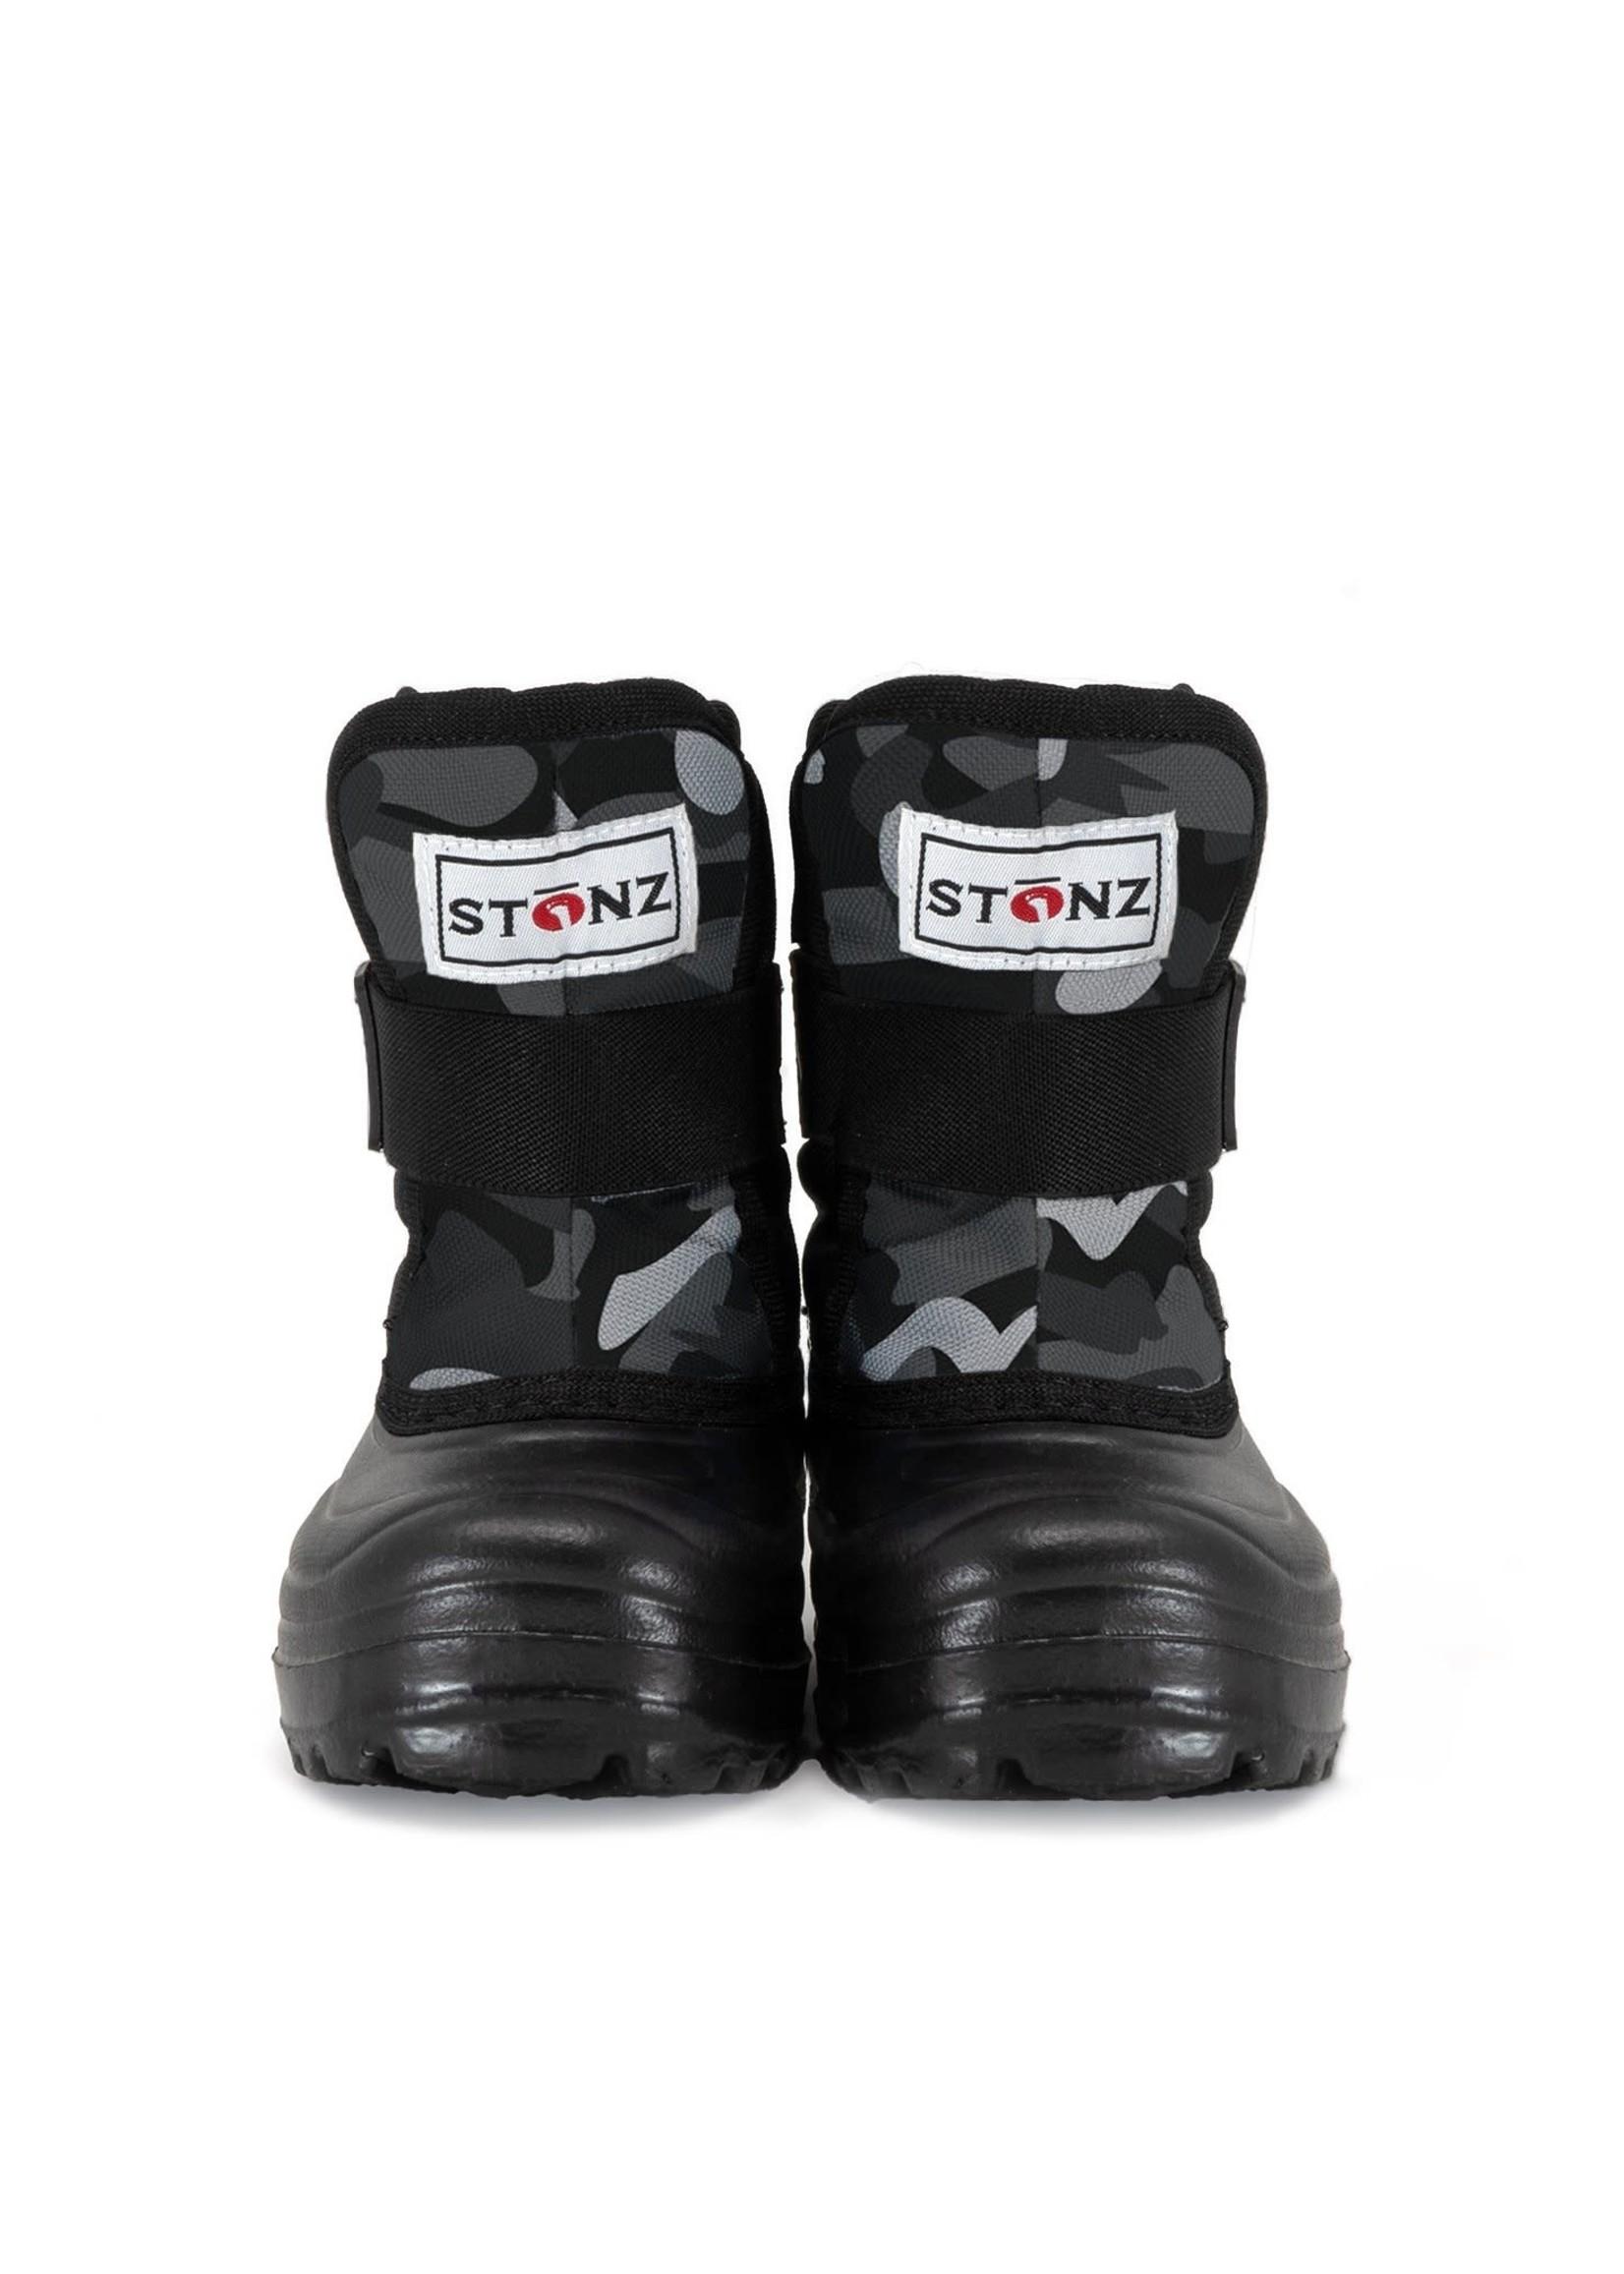 stonz Stonz Boots (Camo)